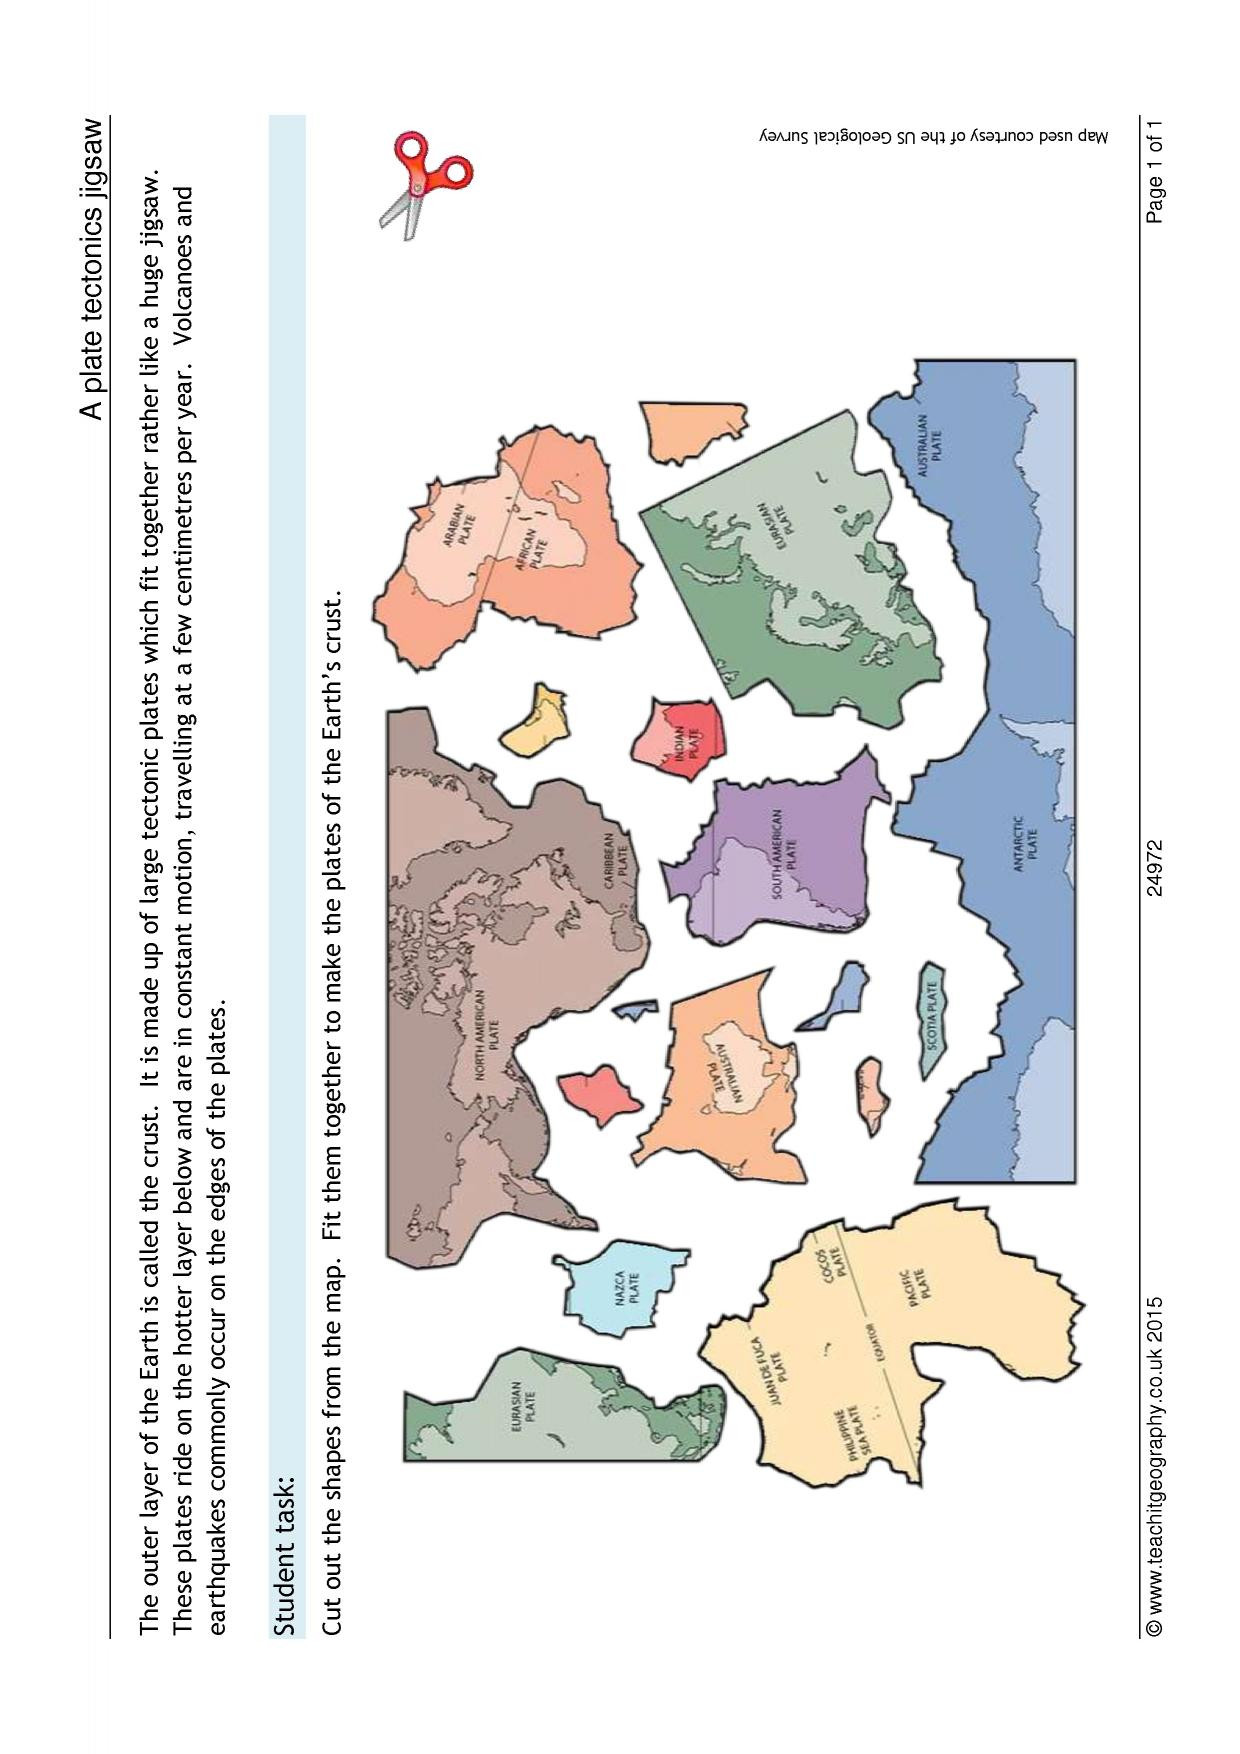 Plate Tectonic Worksheet Answers A Plate Tectonics Jigsaw